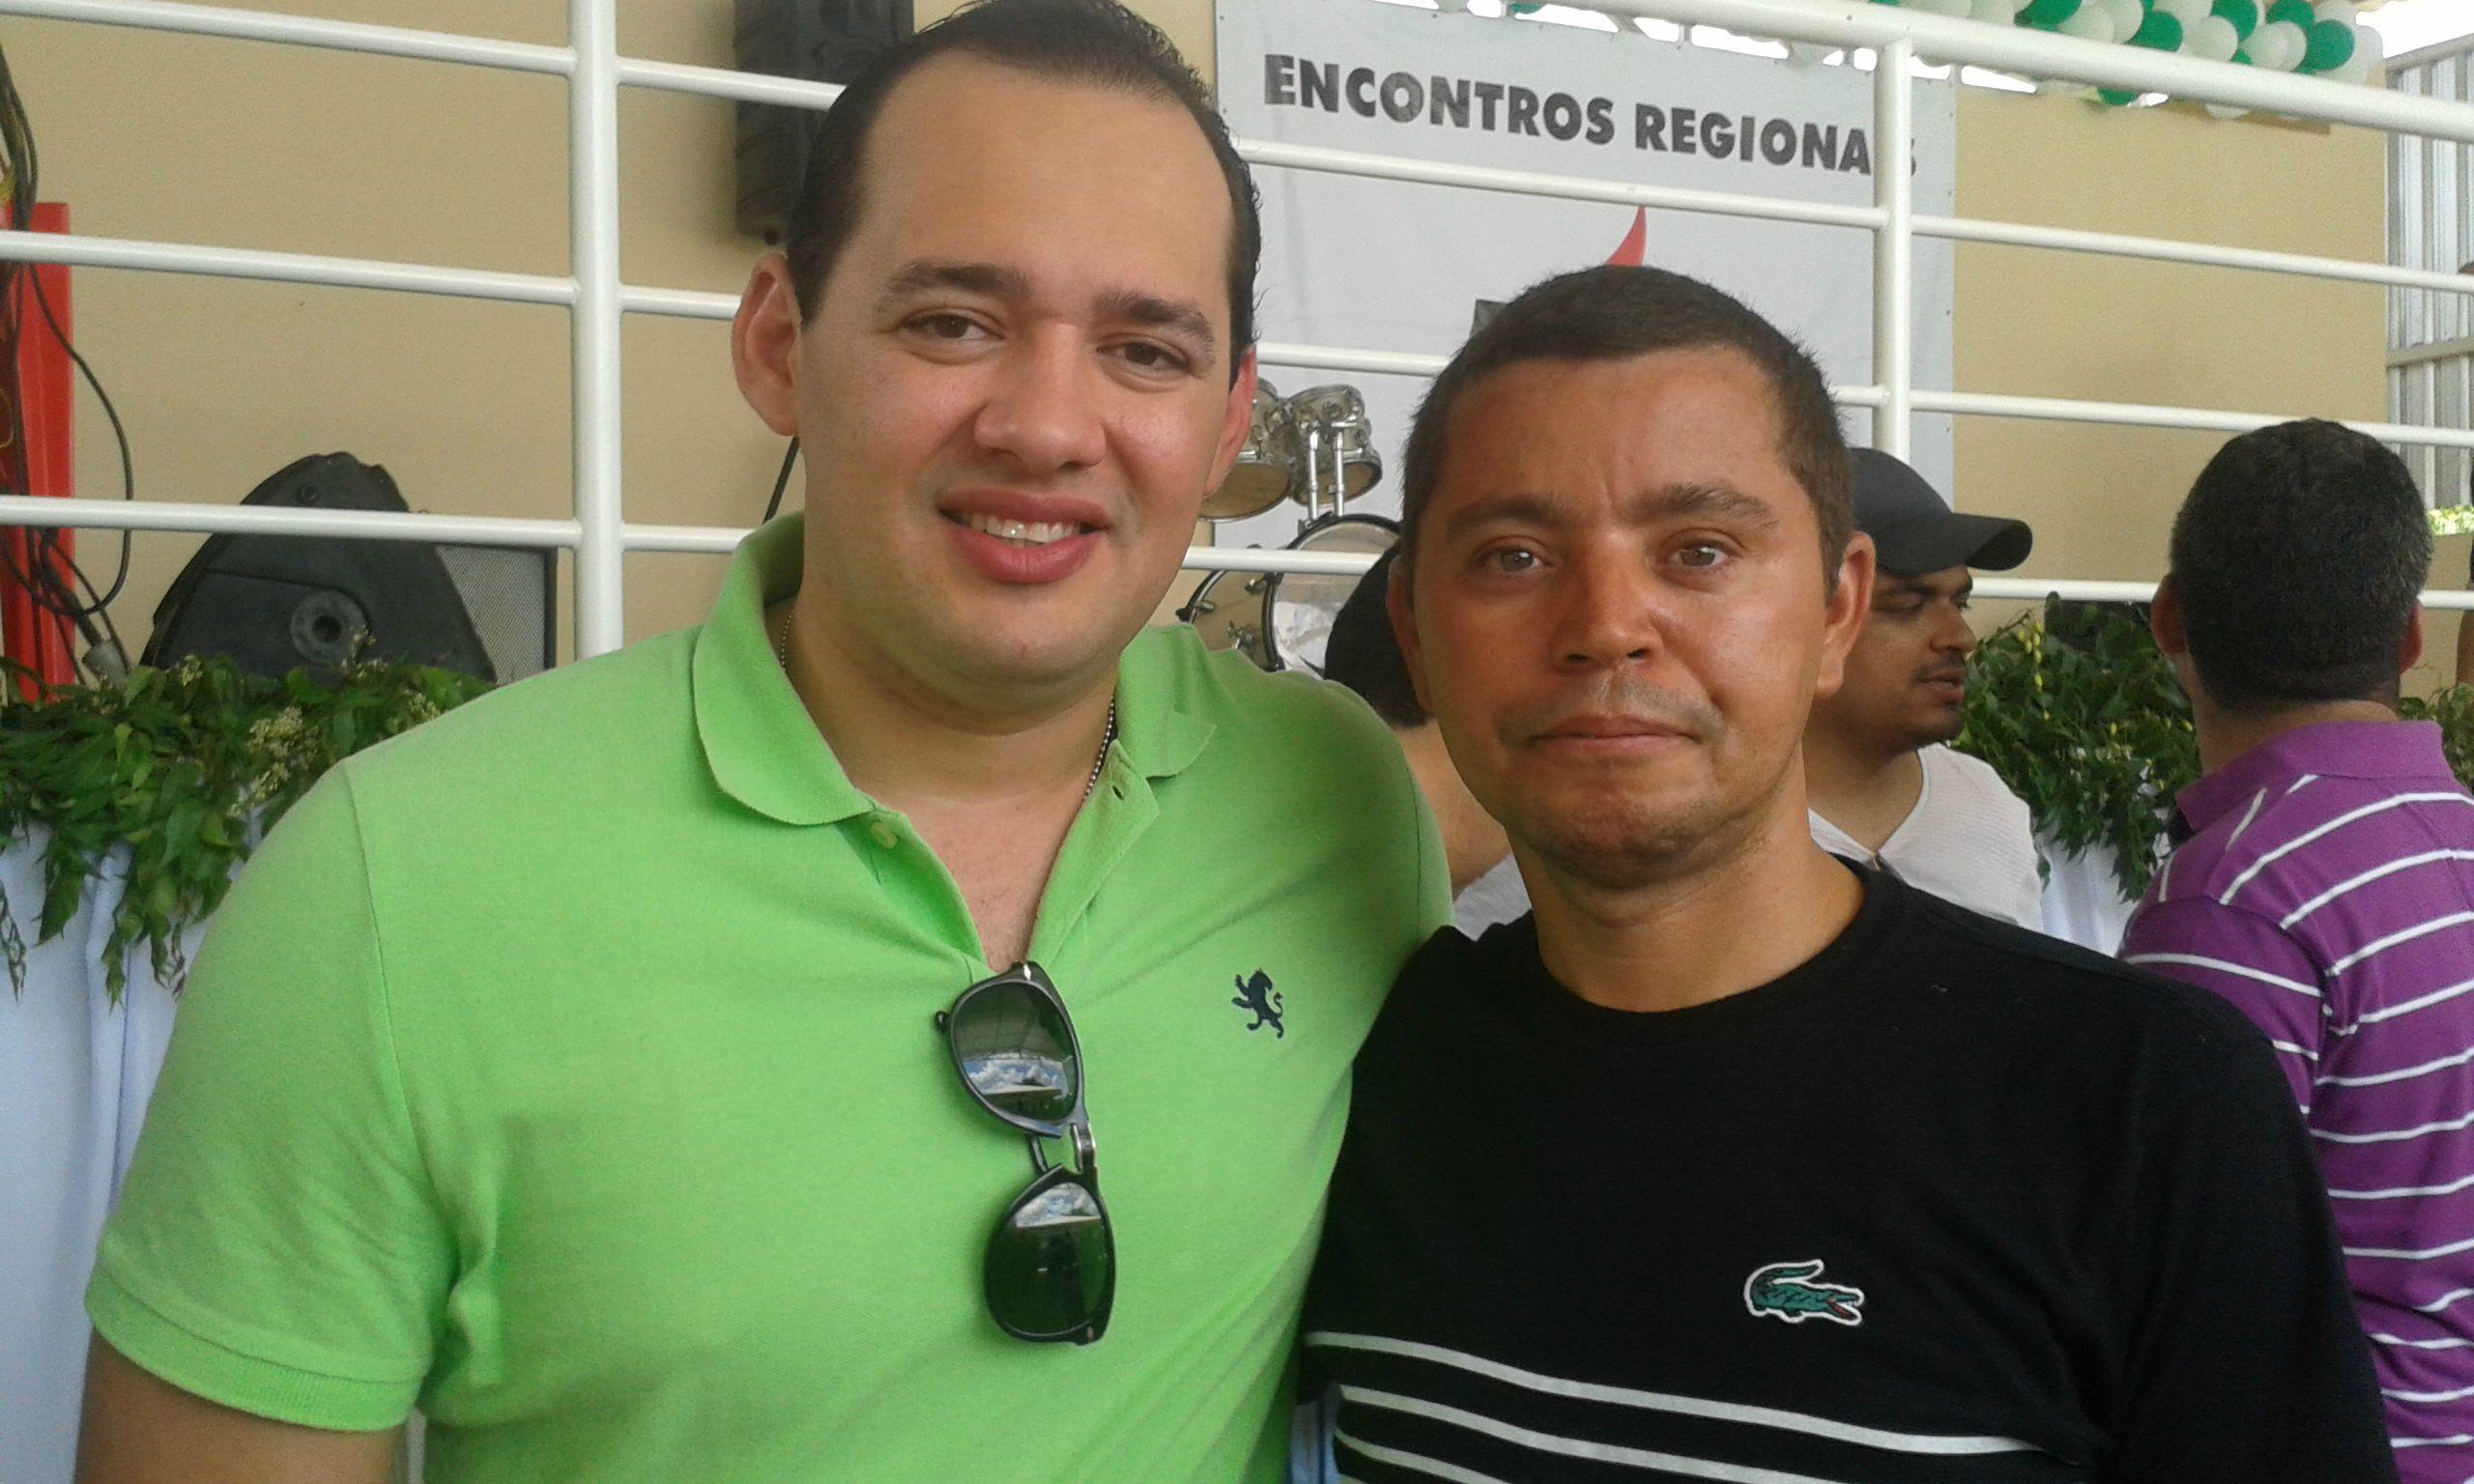 DepEst Daniel Oliveira PMDB